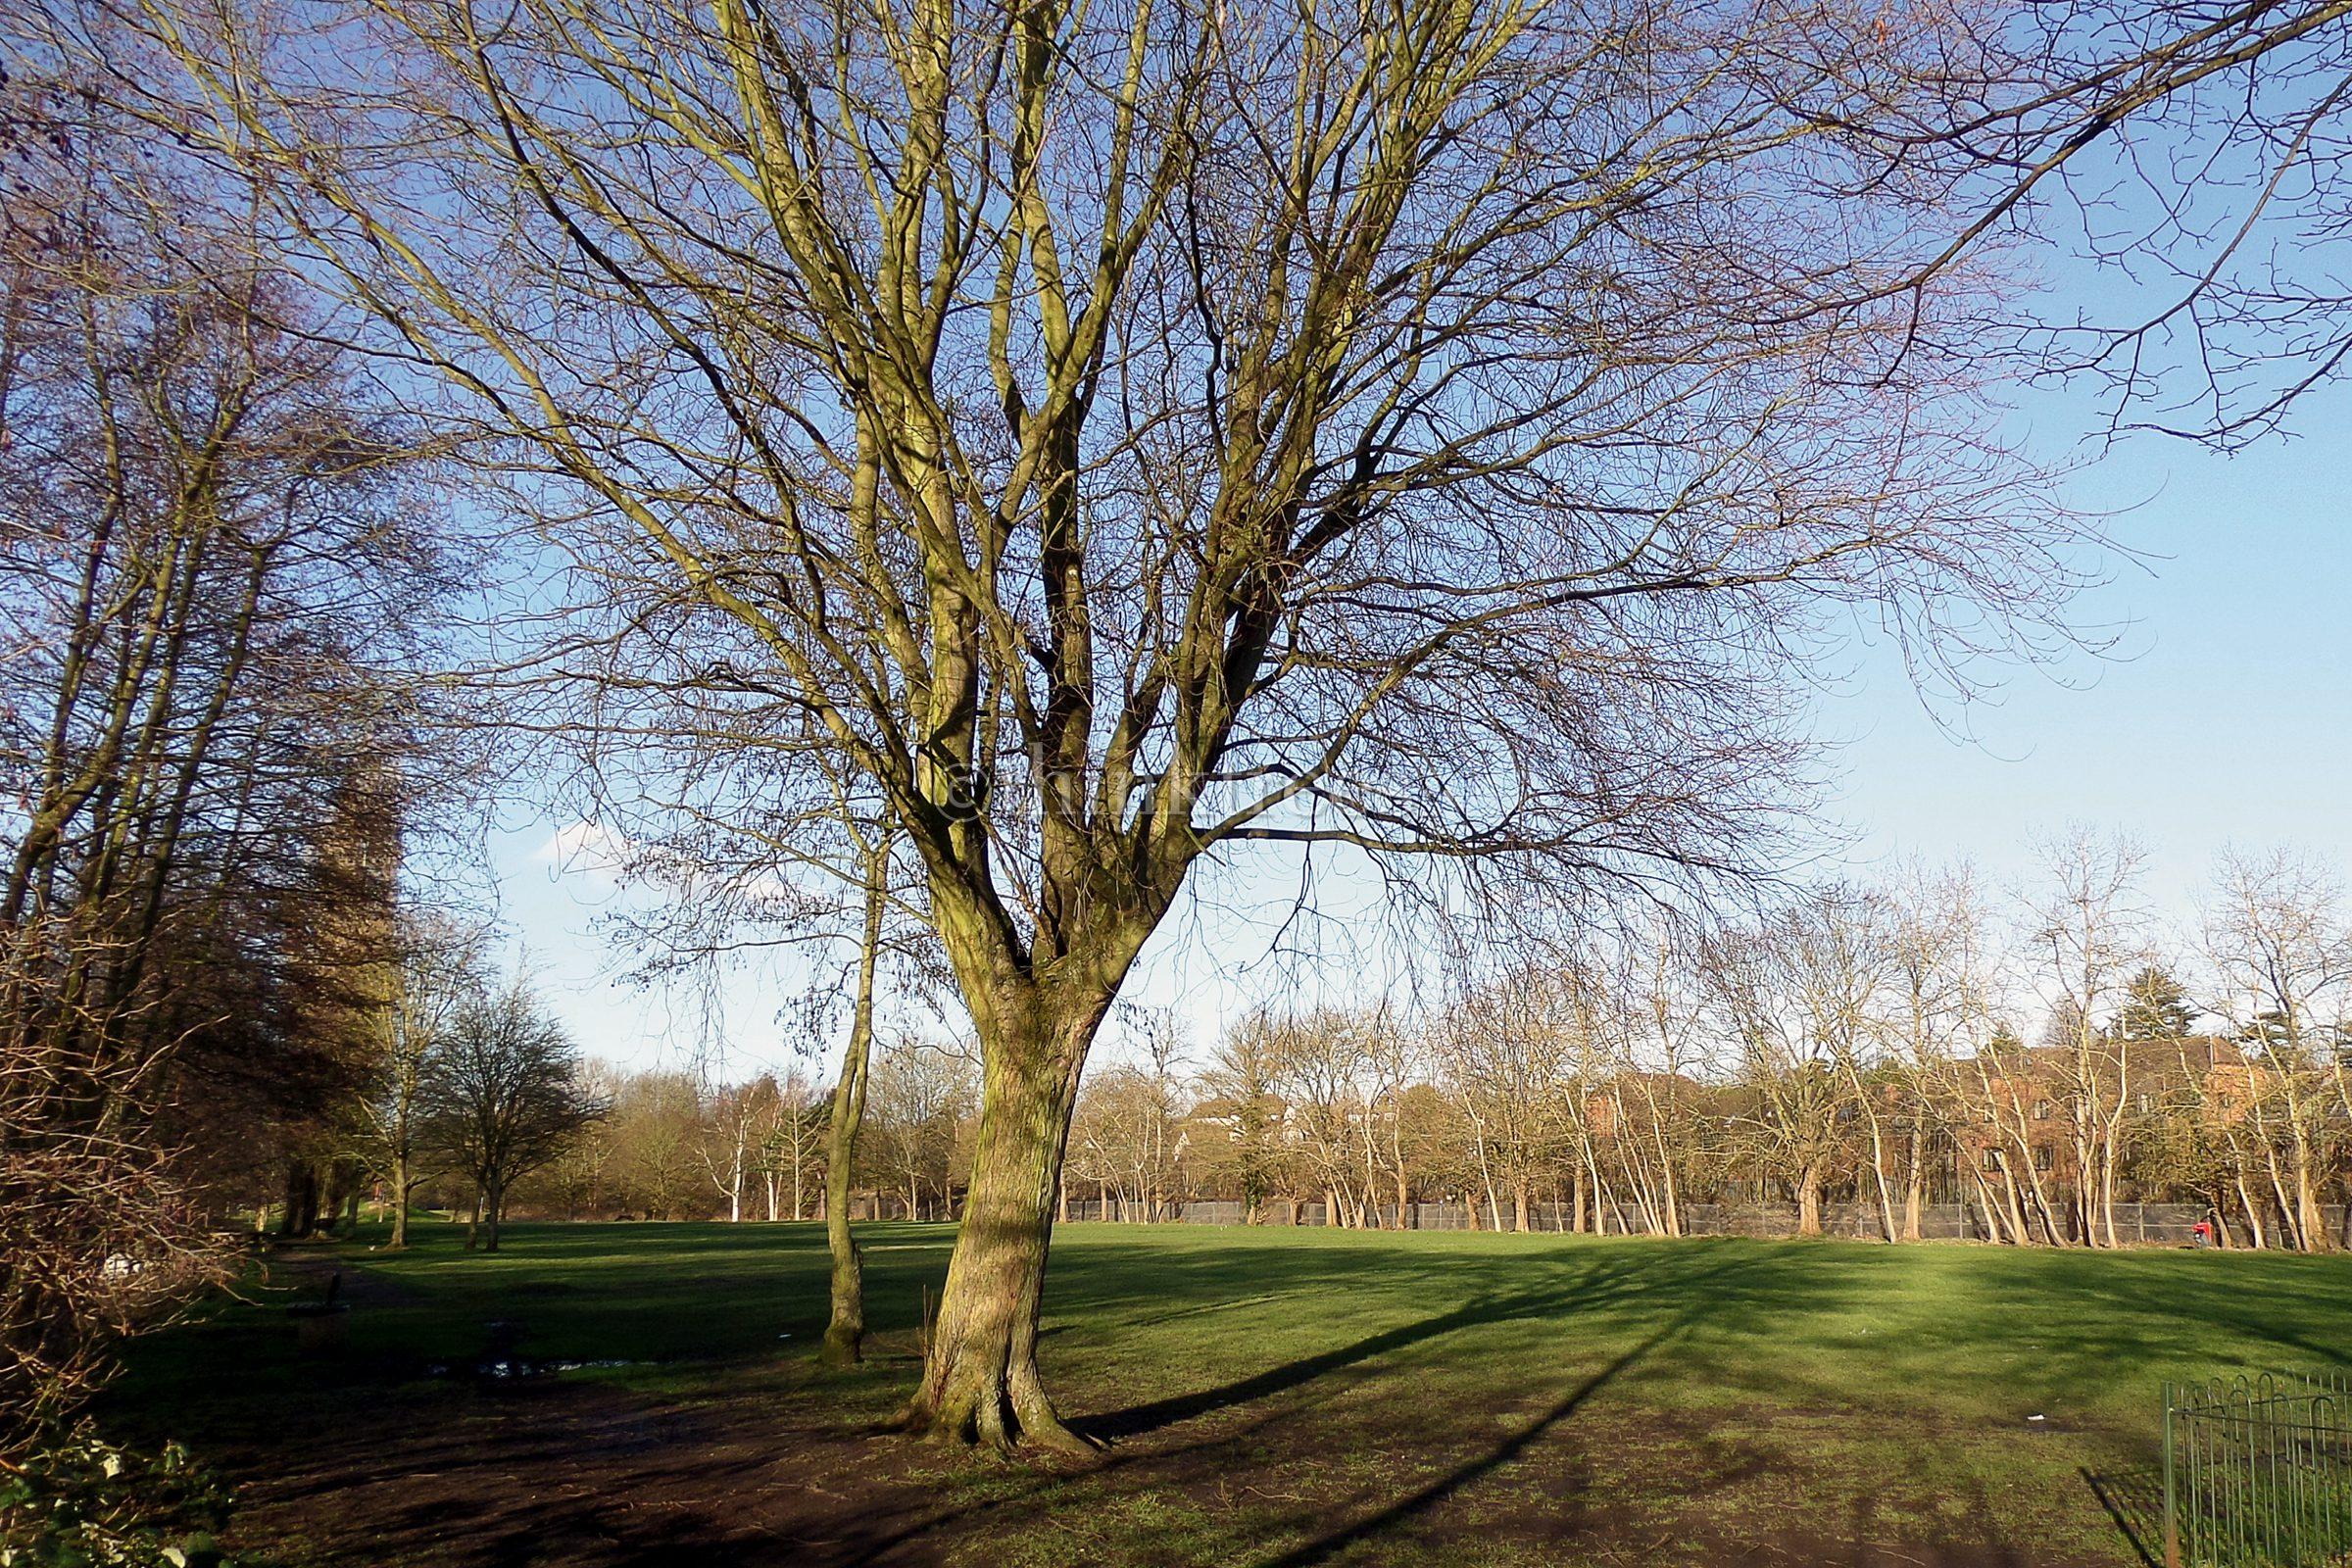 View across Sworders Field in Bishop's Stortford, Hertfordshire